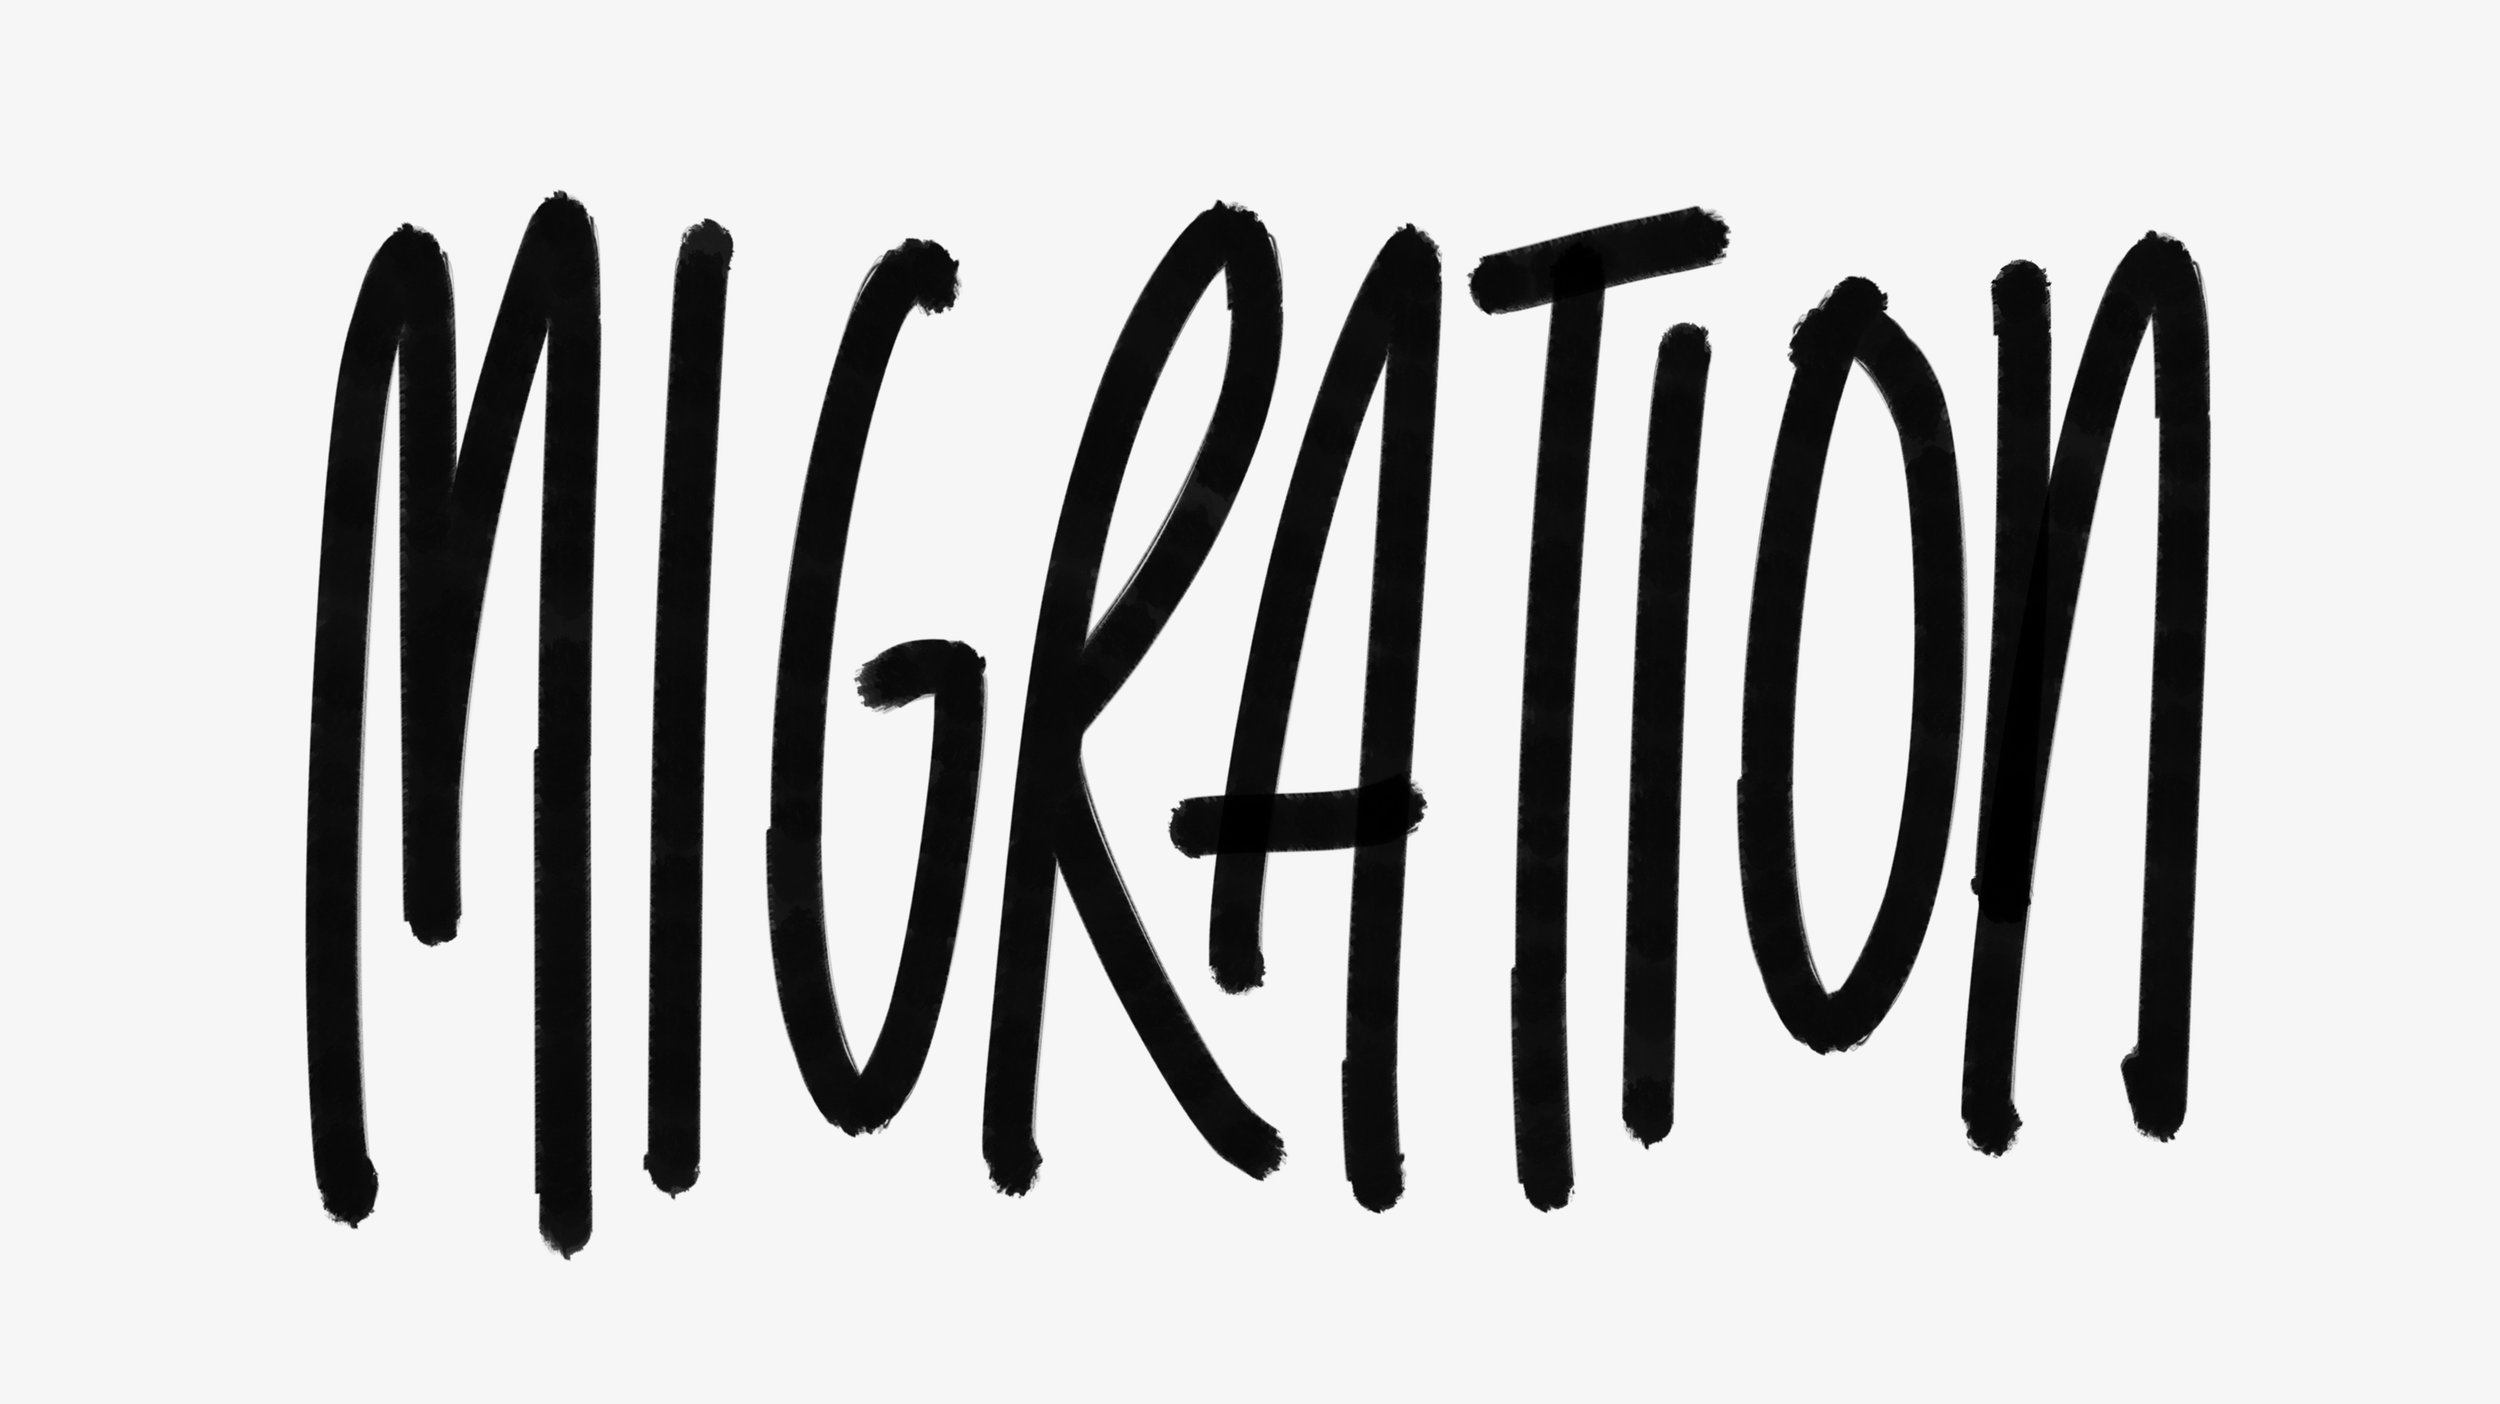 SC_Migration.jpg